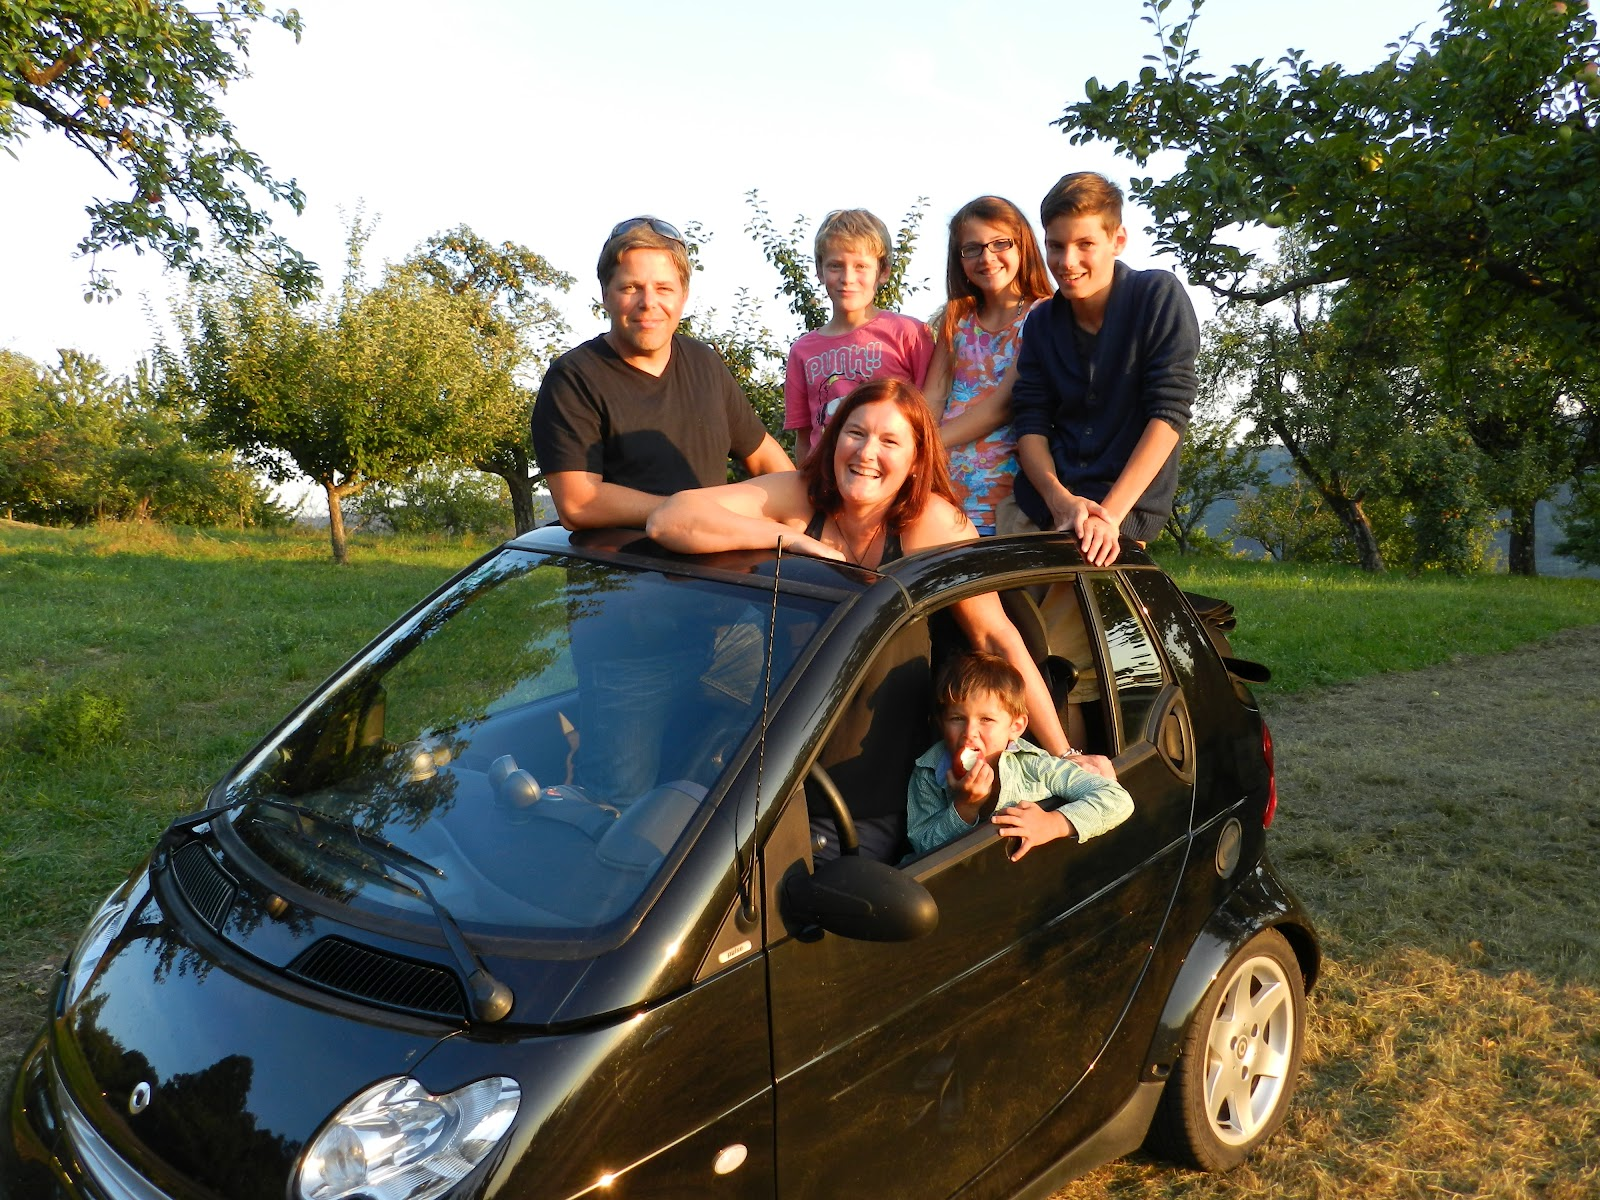 Rae's Blog: Big Family Small Car